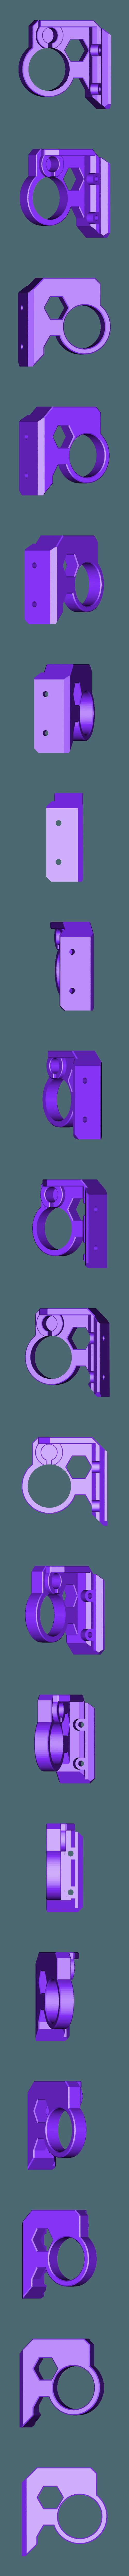 Prusa_Bearing_Mount_RHS.stl Download free STL file Z Tops for Prusa MK3S • 3D printer object, TaylorsMake